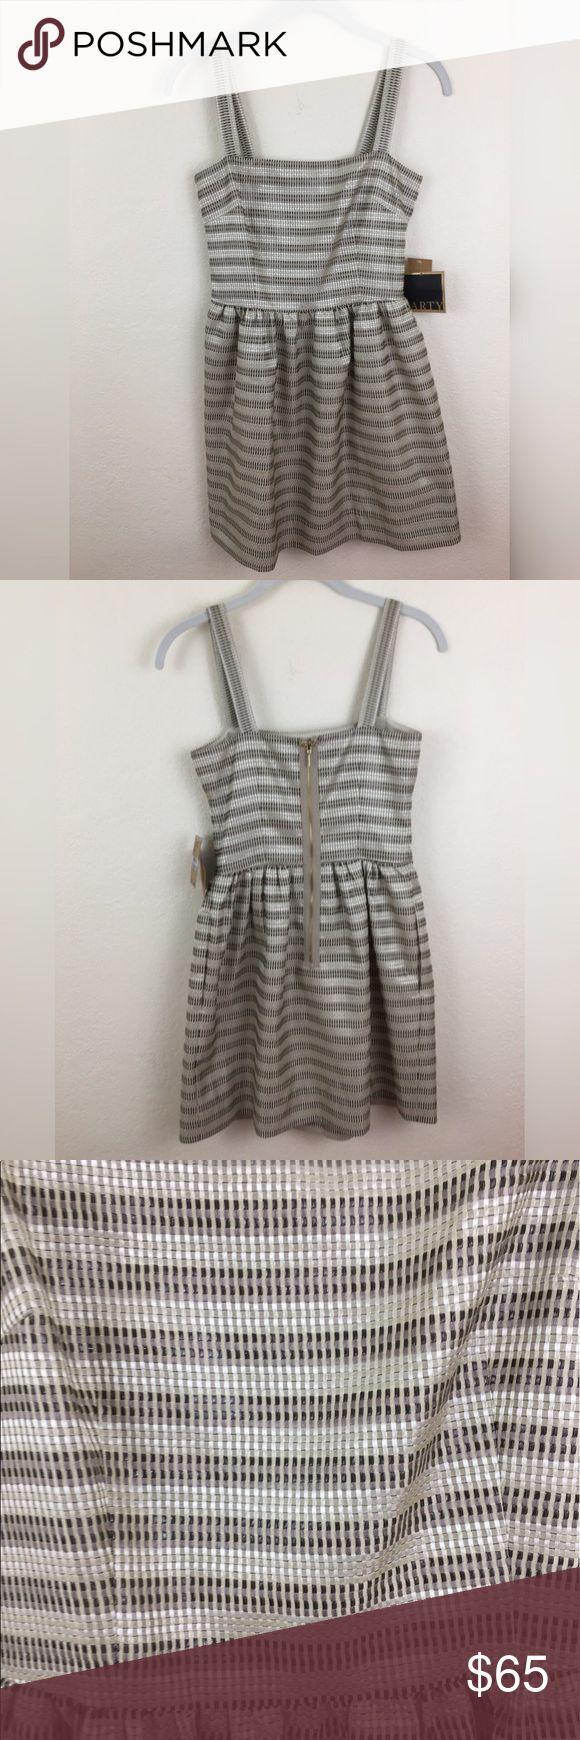 "RACHEL Rachel Roy Sleeveless Metallic Party Dress Brand new with tags. Comes from a smoke free home. 90% Polyester, 10% Metallic.                                      Armpit to Armpit - 14 3/4"".                                                      Bust - 29 1/2"".                                                                           Length - 31 3/4"" RACHEL Rachel Roy Dresses"